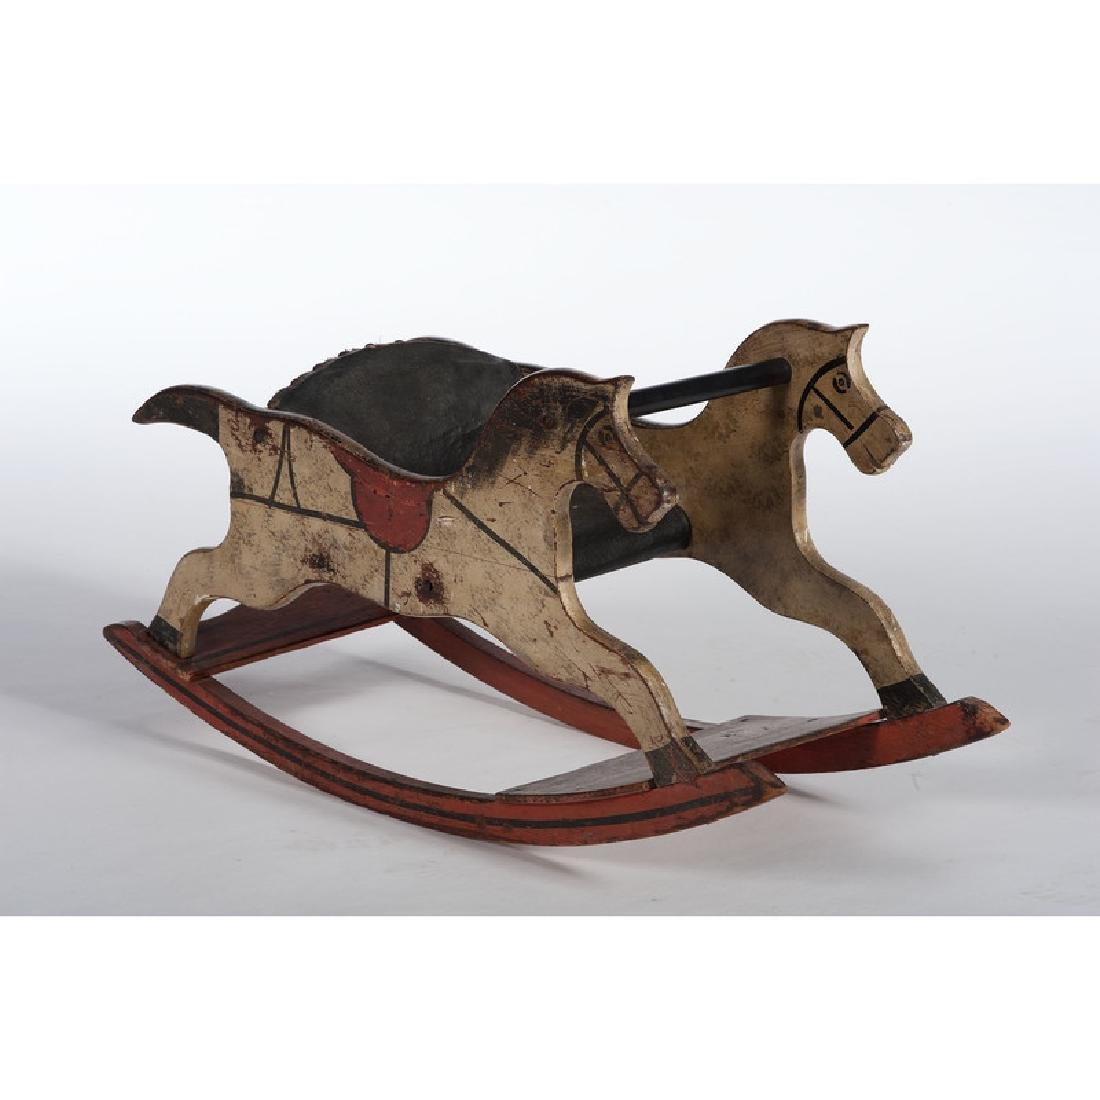 Child's Painted Horse Rocker